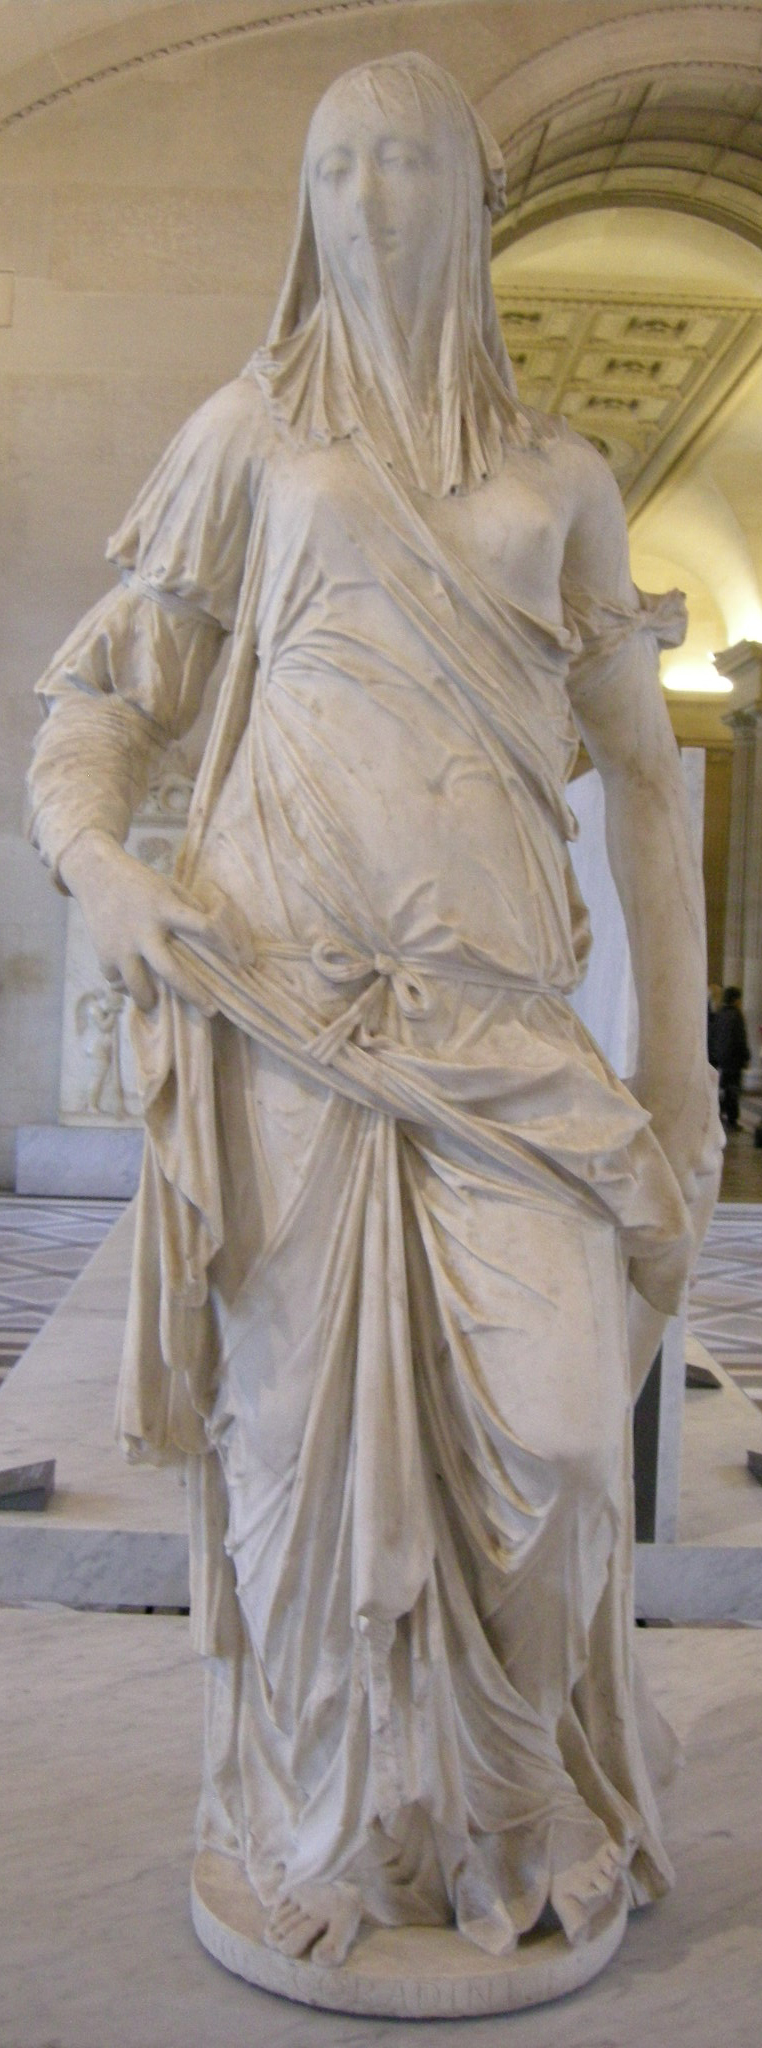 3. Dama velada (Fe), Corradini